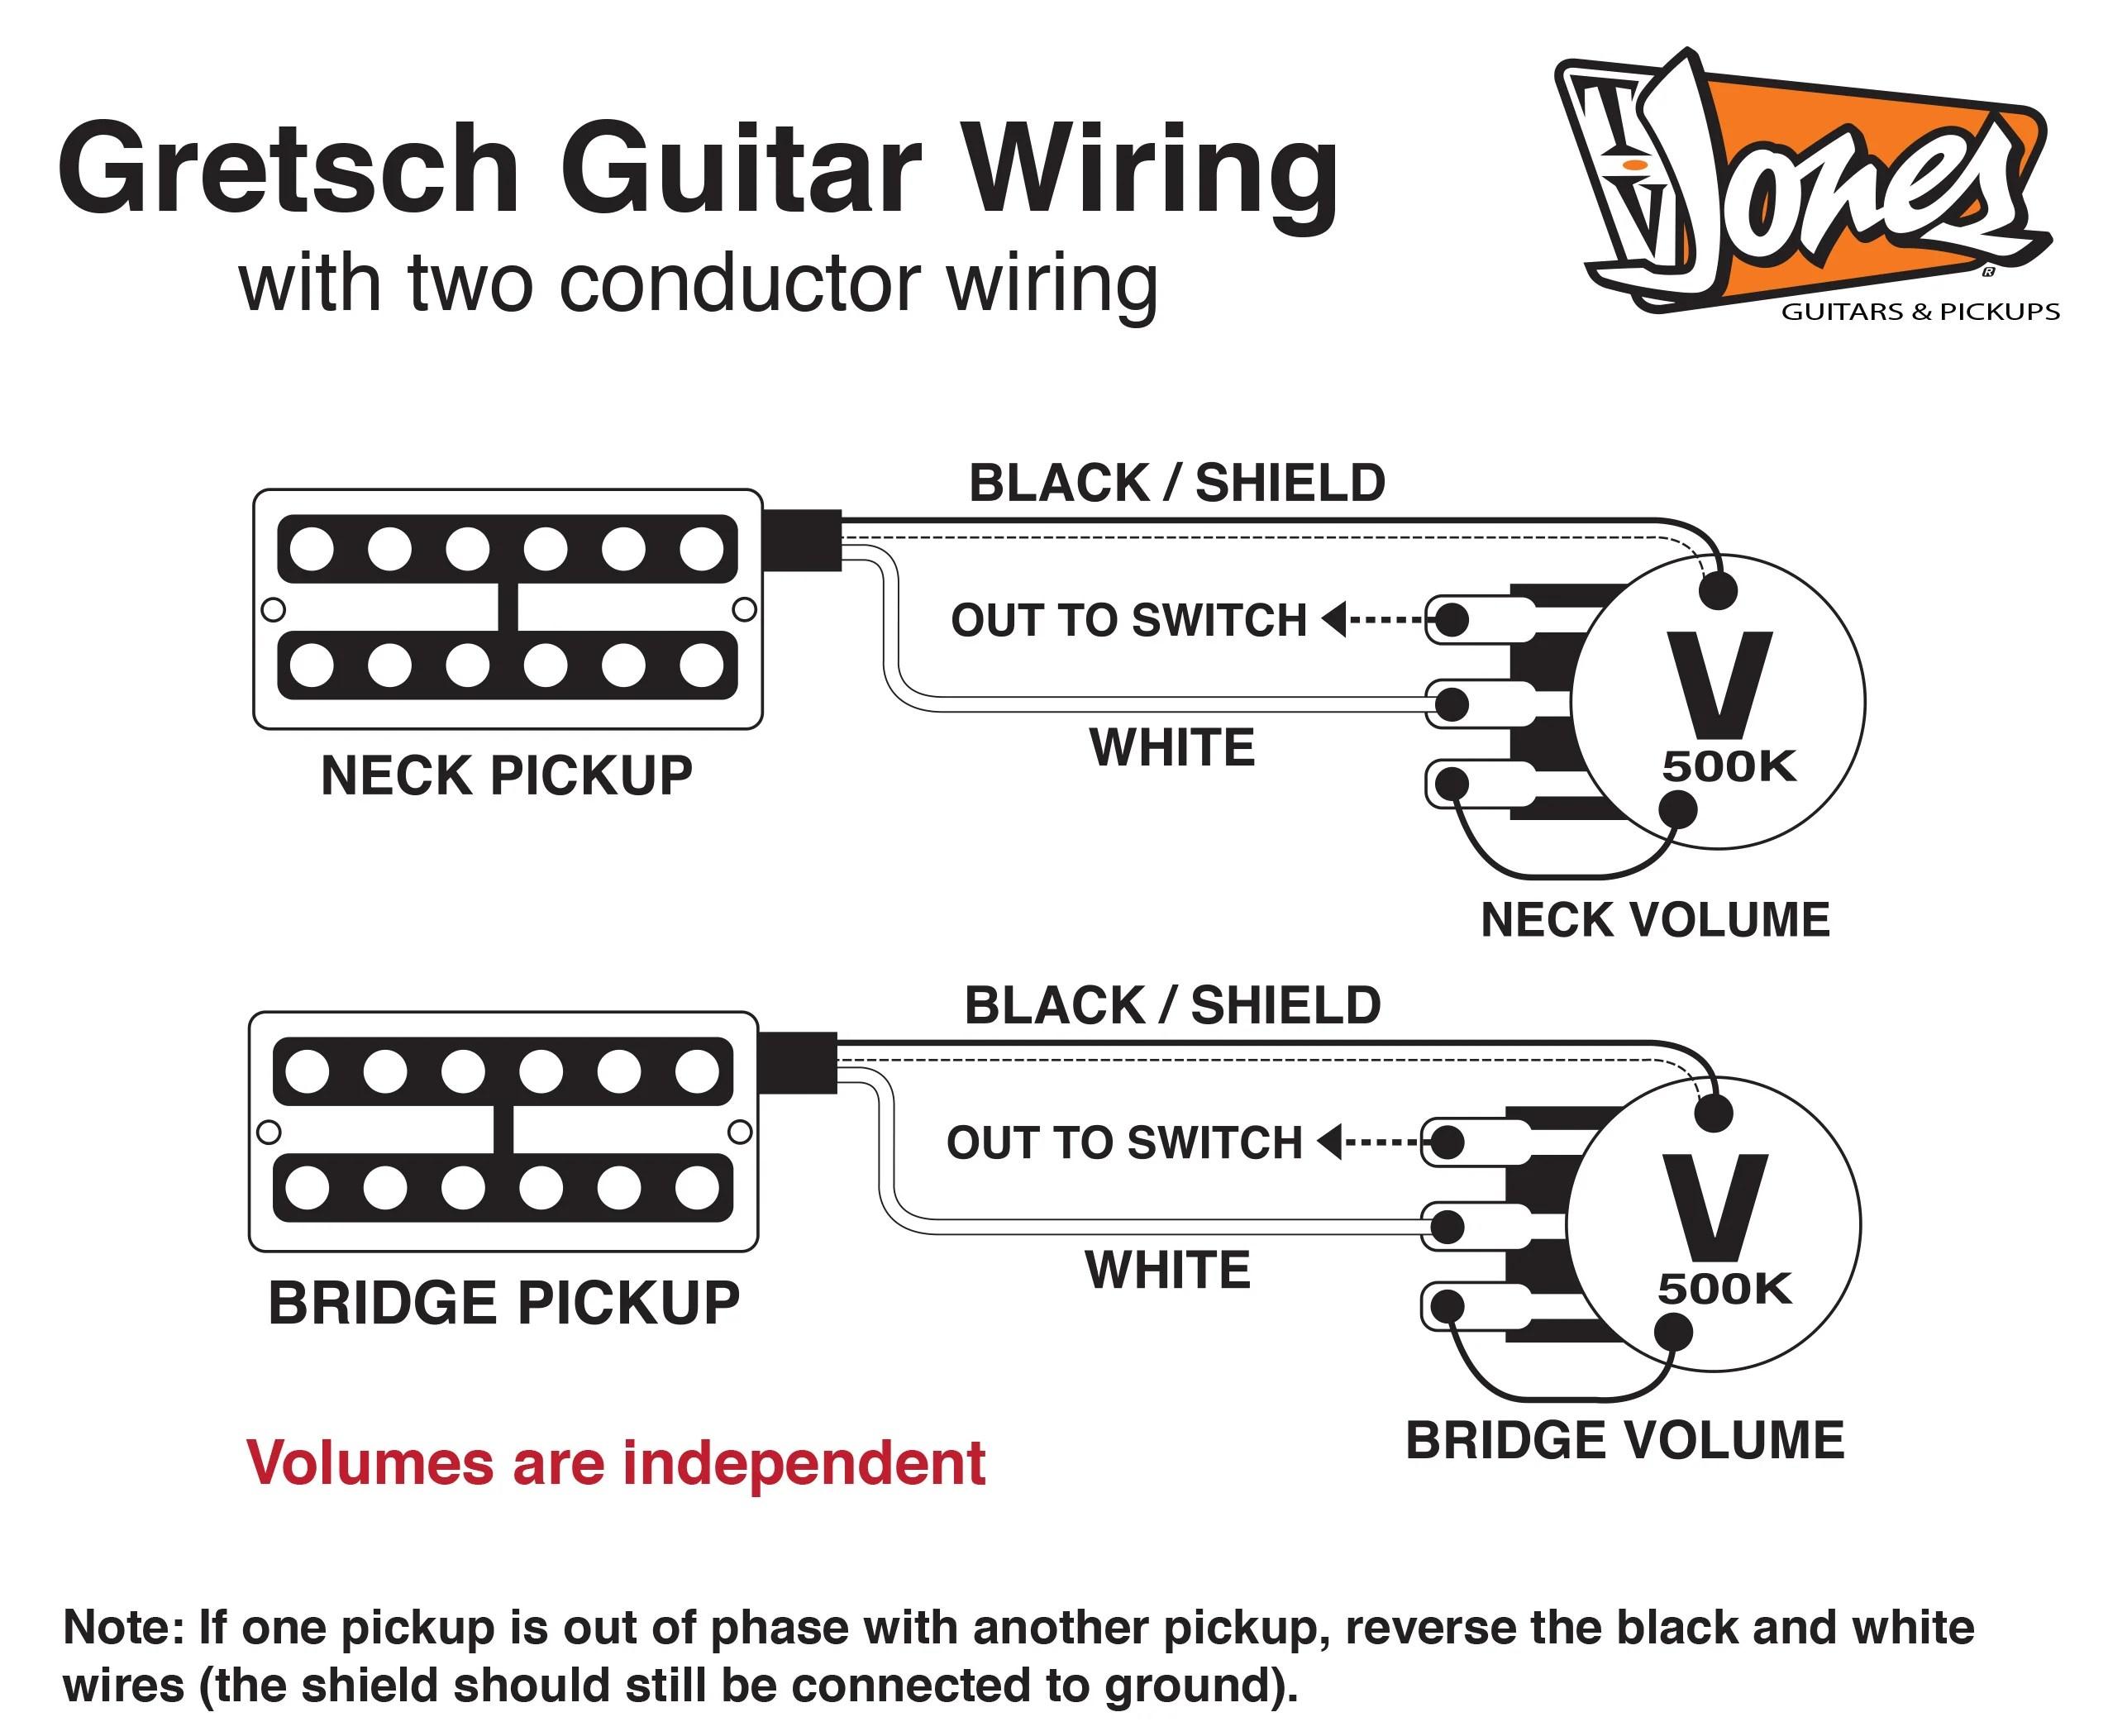 small resolution of gretsch wiring diagrams schematic diagramsgretsch guitar wiring diagrams electrical wiring diagrams gretsch guitar wiring diagrams gretsch